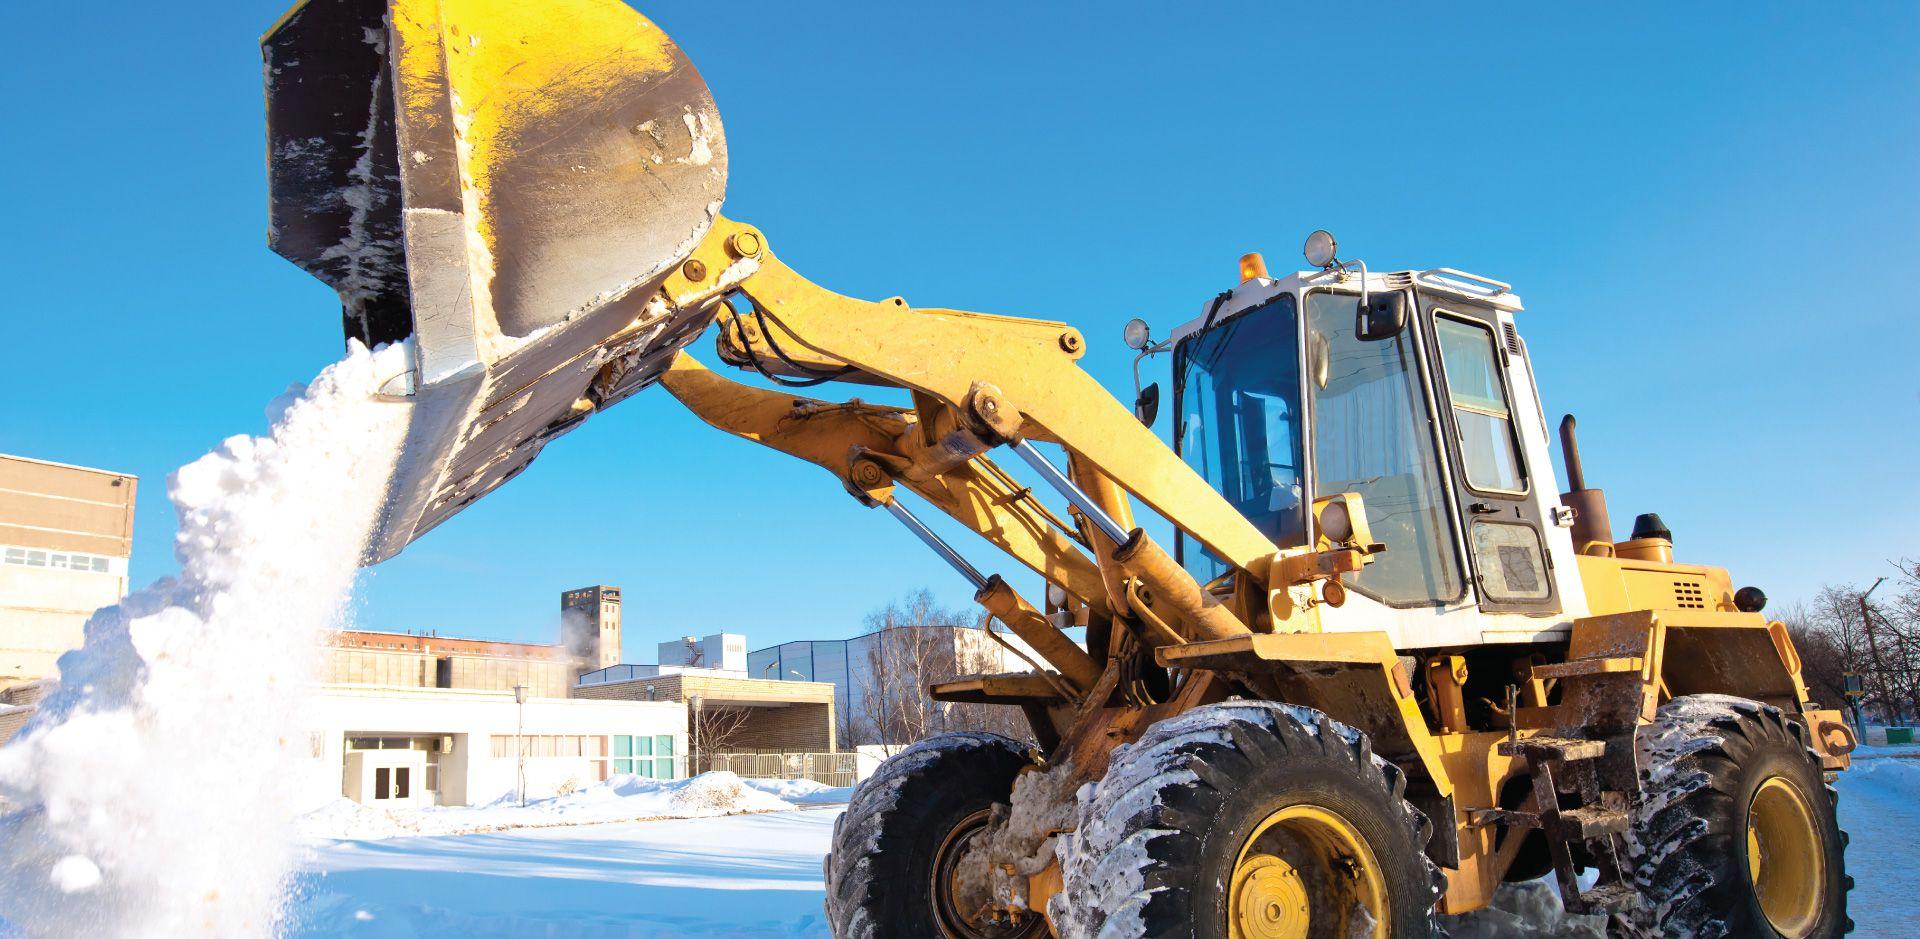 Marsten Snow Removal Ottawa Removal Services Heavy Equipment Coastal